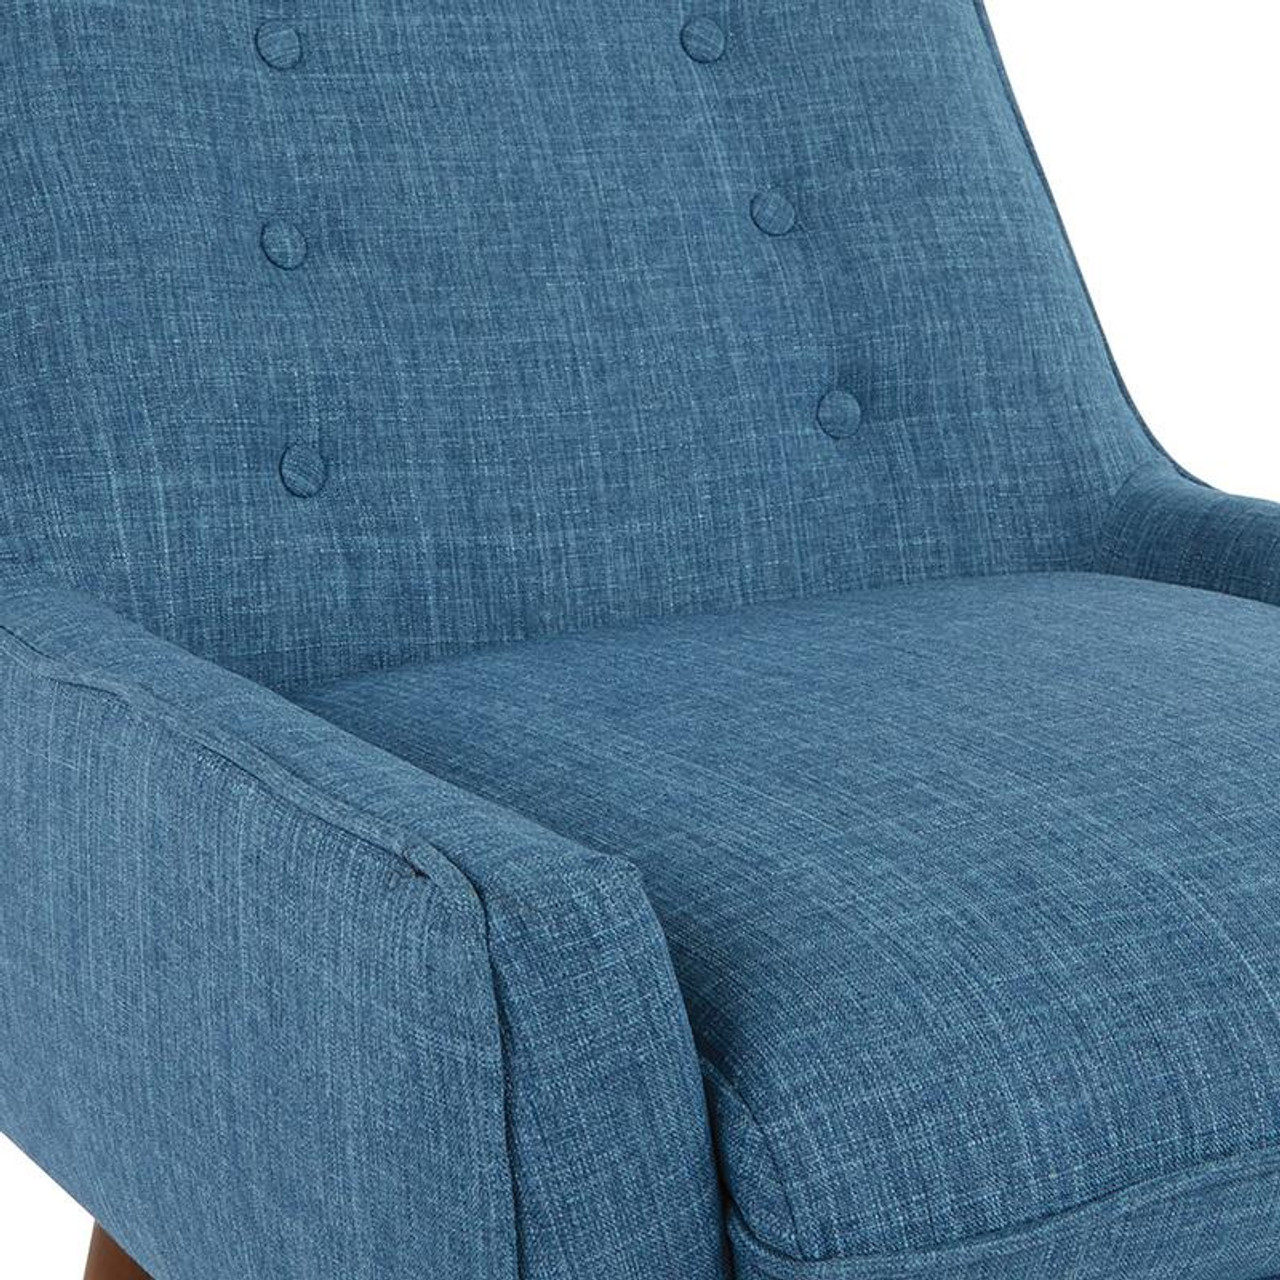 Office Star Rhodes Chair In Blue Fabric With Coffee Legs Rhd51 M21